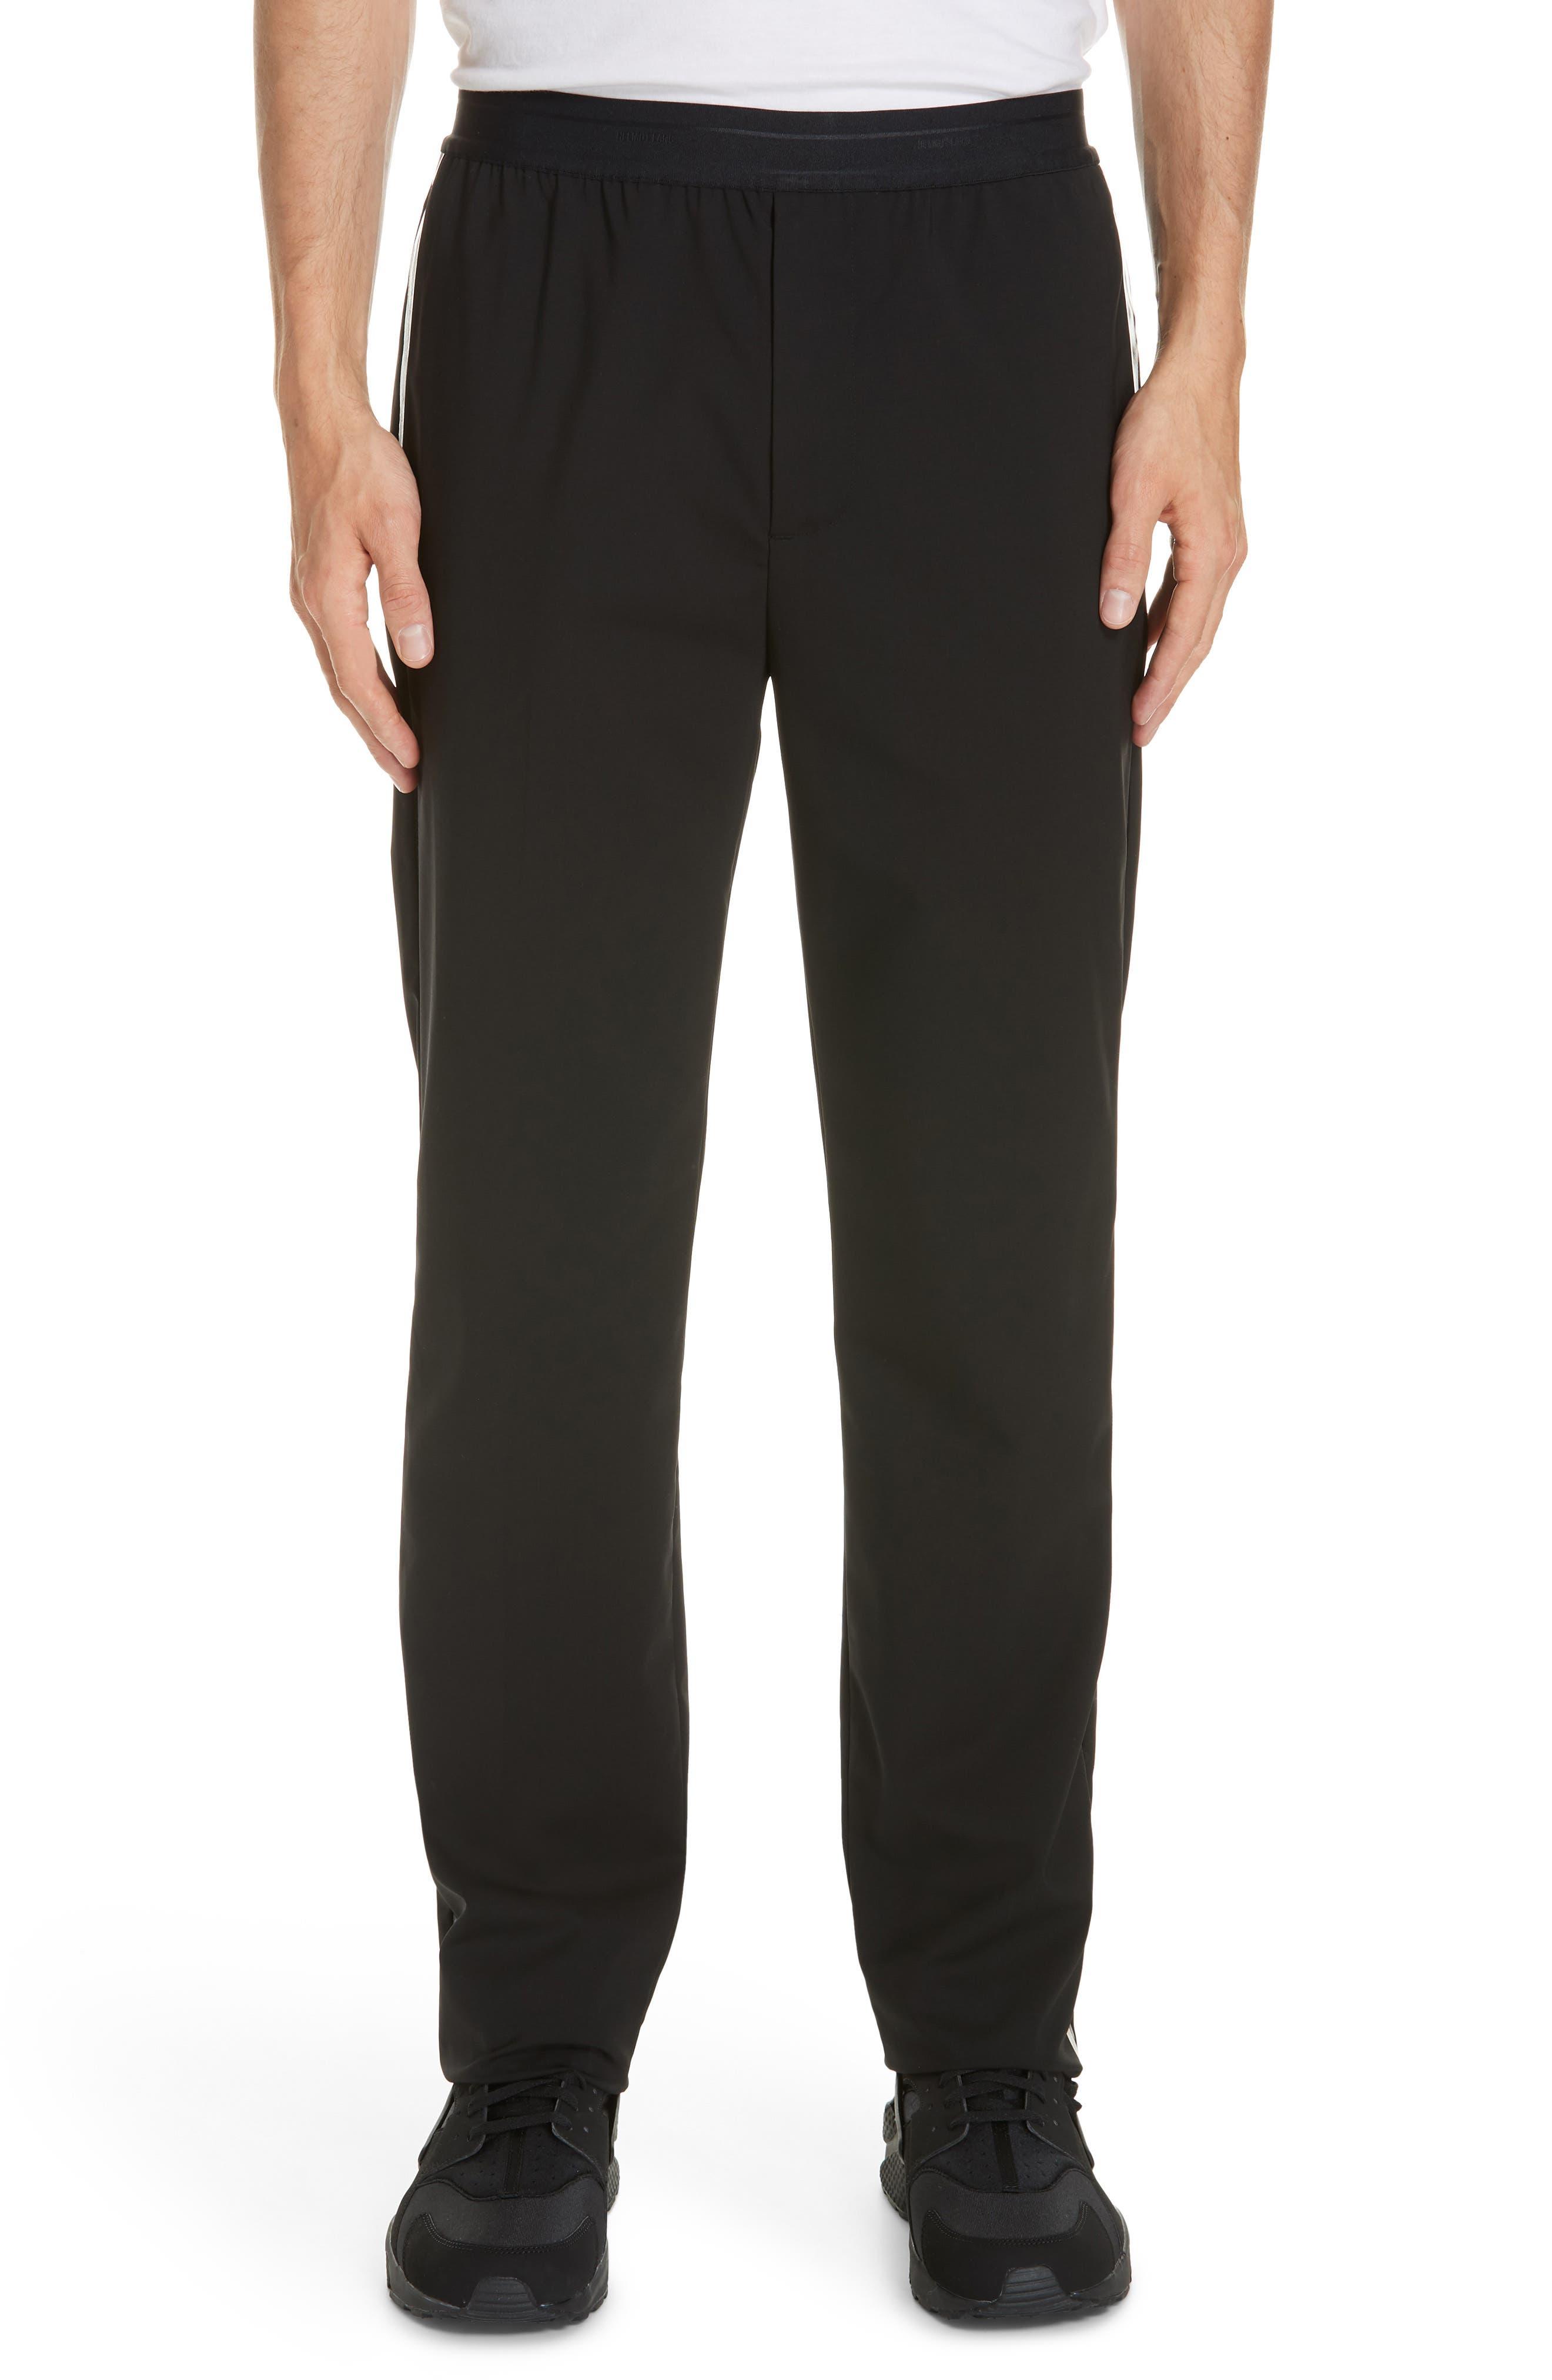 HELMUT LANG, Wool Pants, Main thumbnail 1, color, BLACK ON BLACK